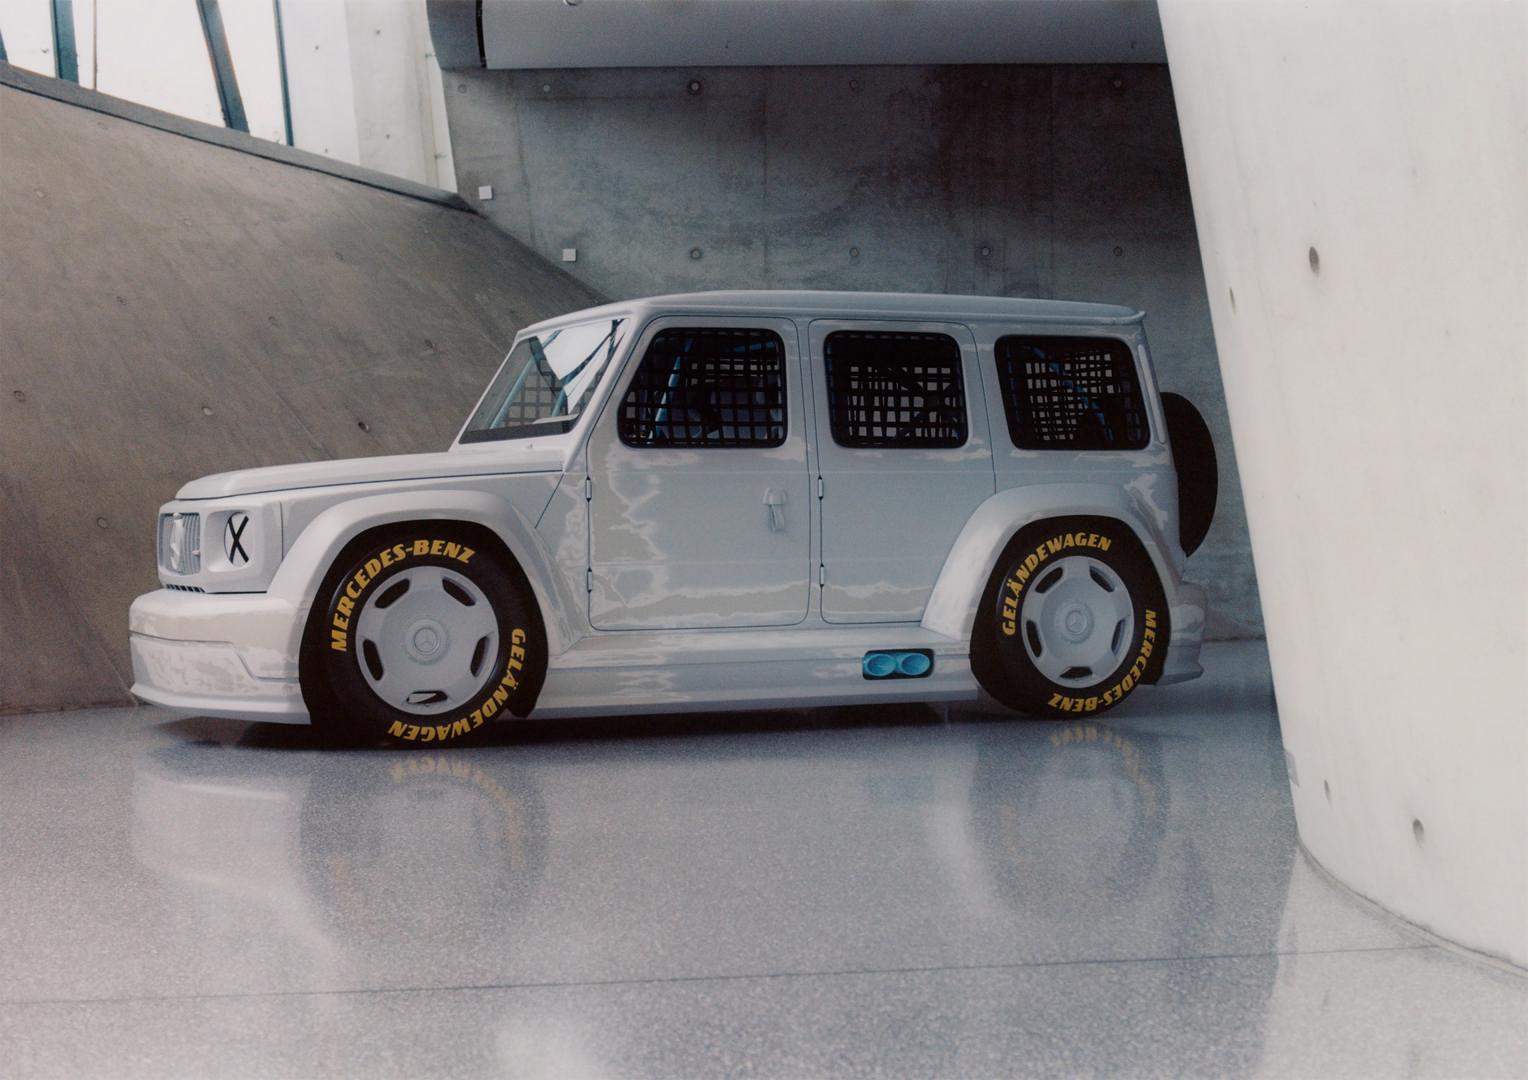 Mercedes-Benz G-Wagon Wheels